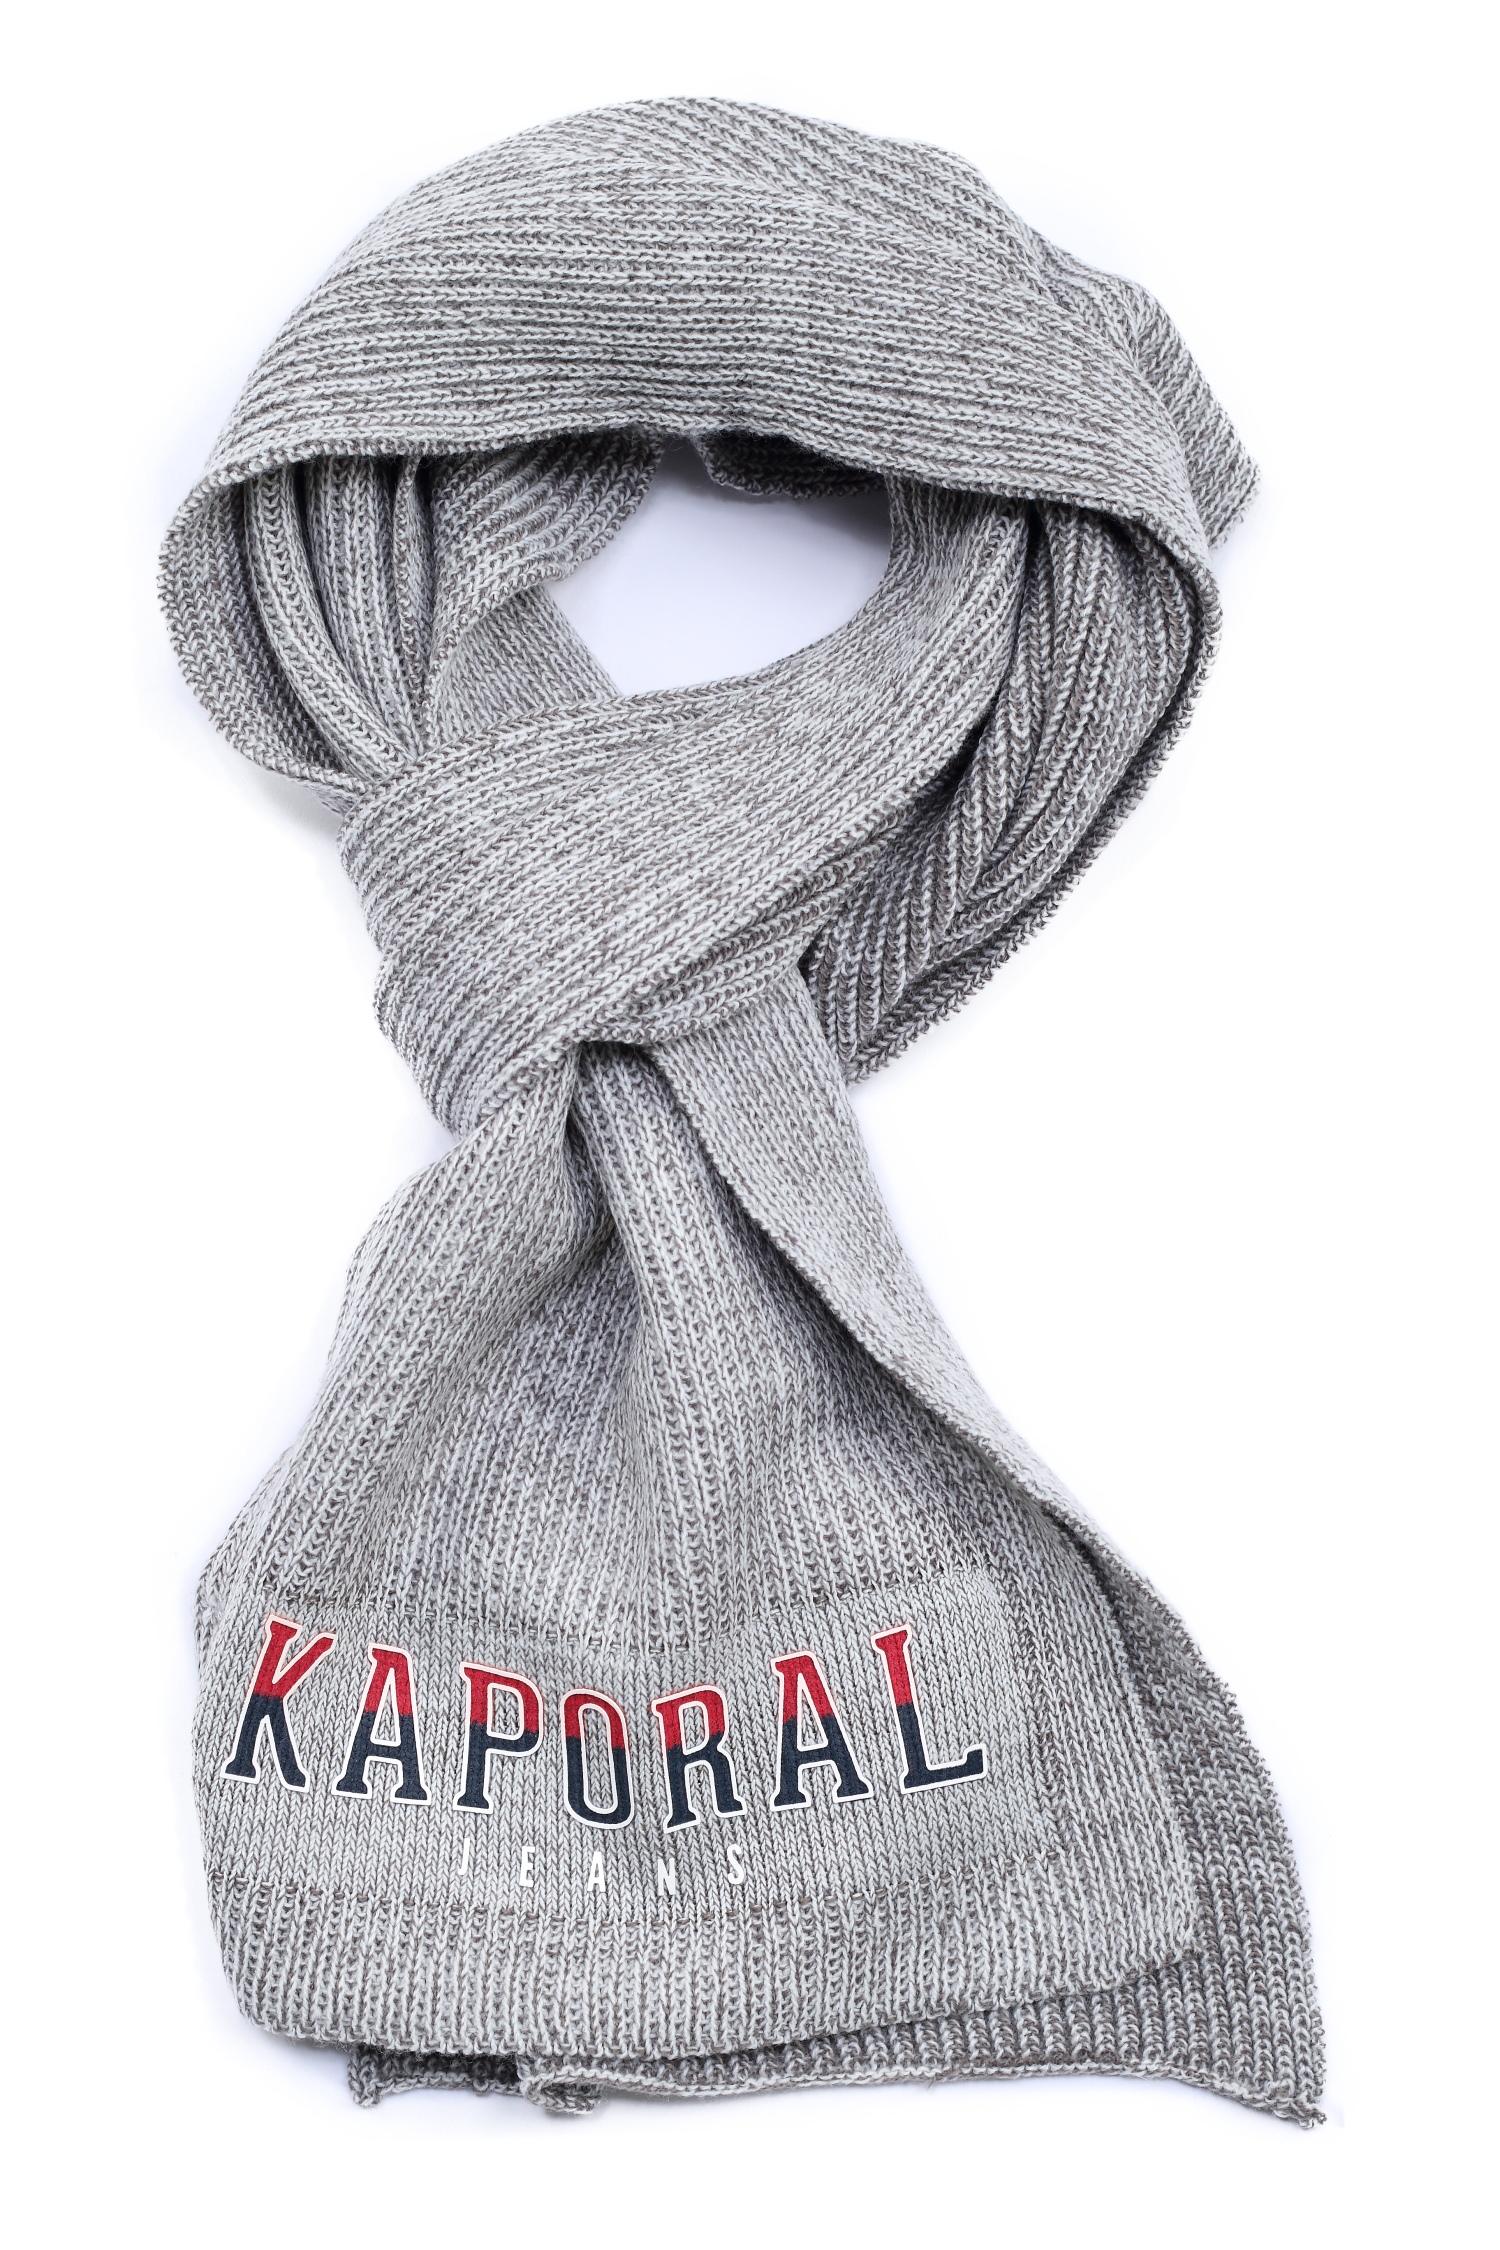 http://www.leadermode.com/180151/kaporal-bilik-medium-grey-mel.jpg